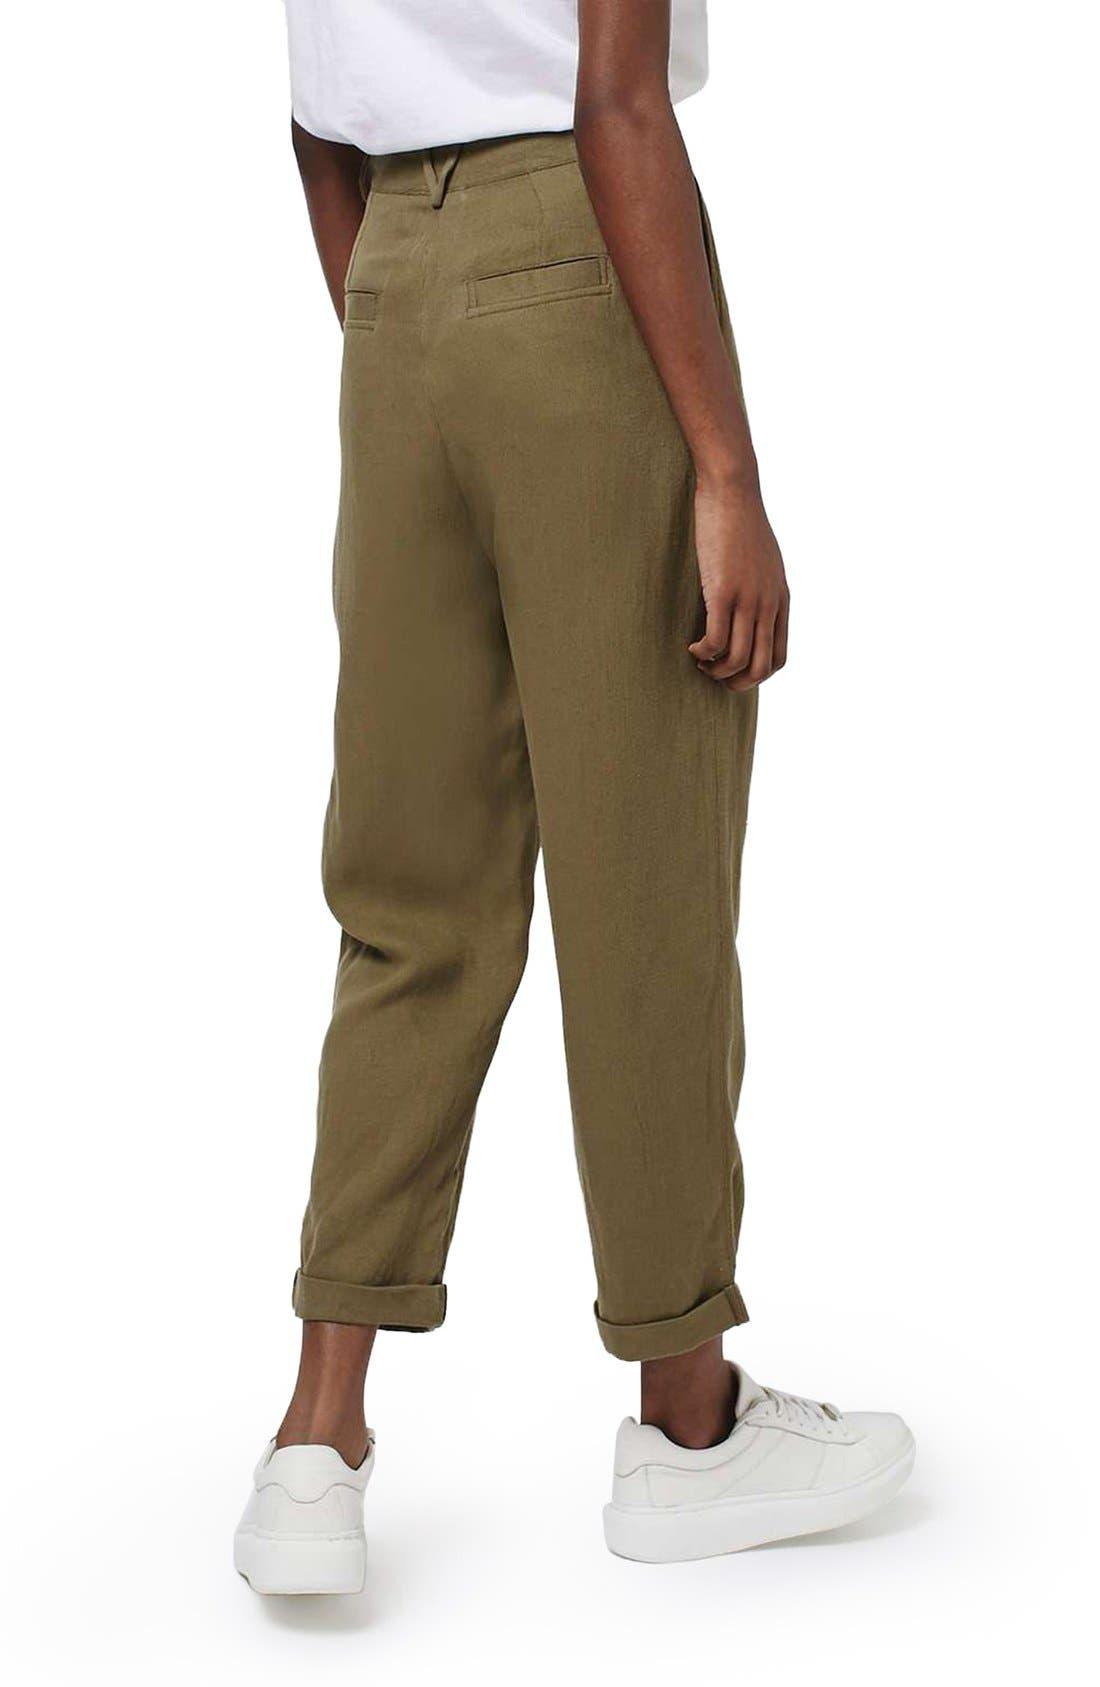 Alternate Image 2  - Topshop 'Mensy' Corduroy Peg Trousers